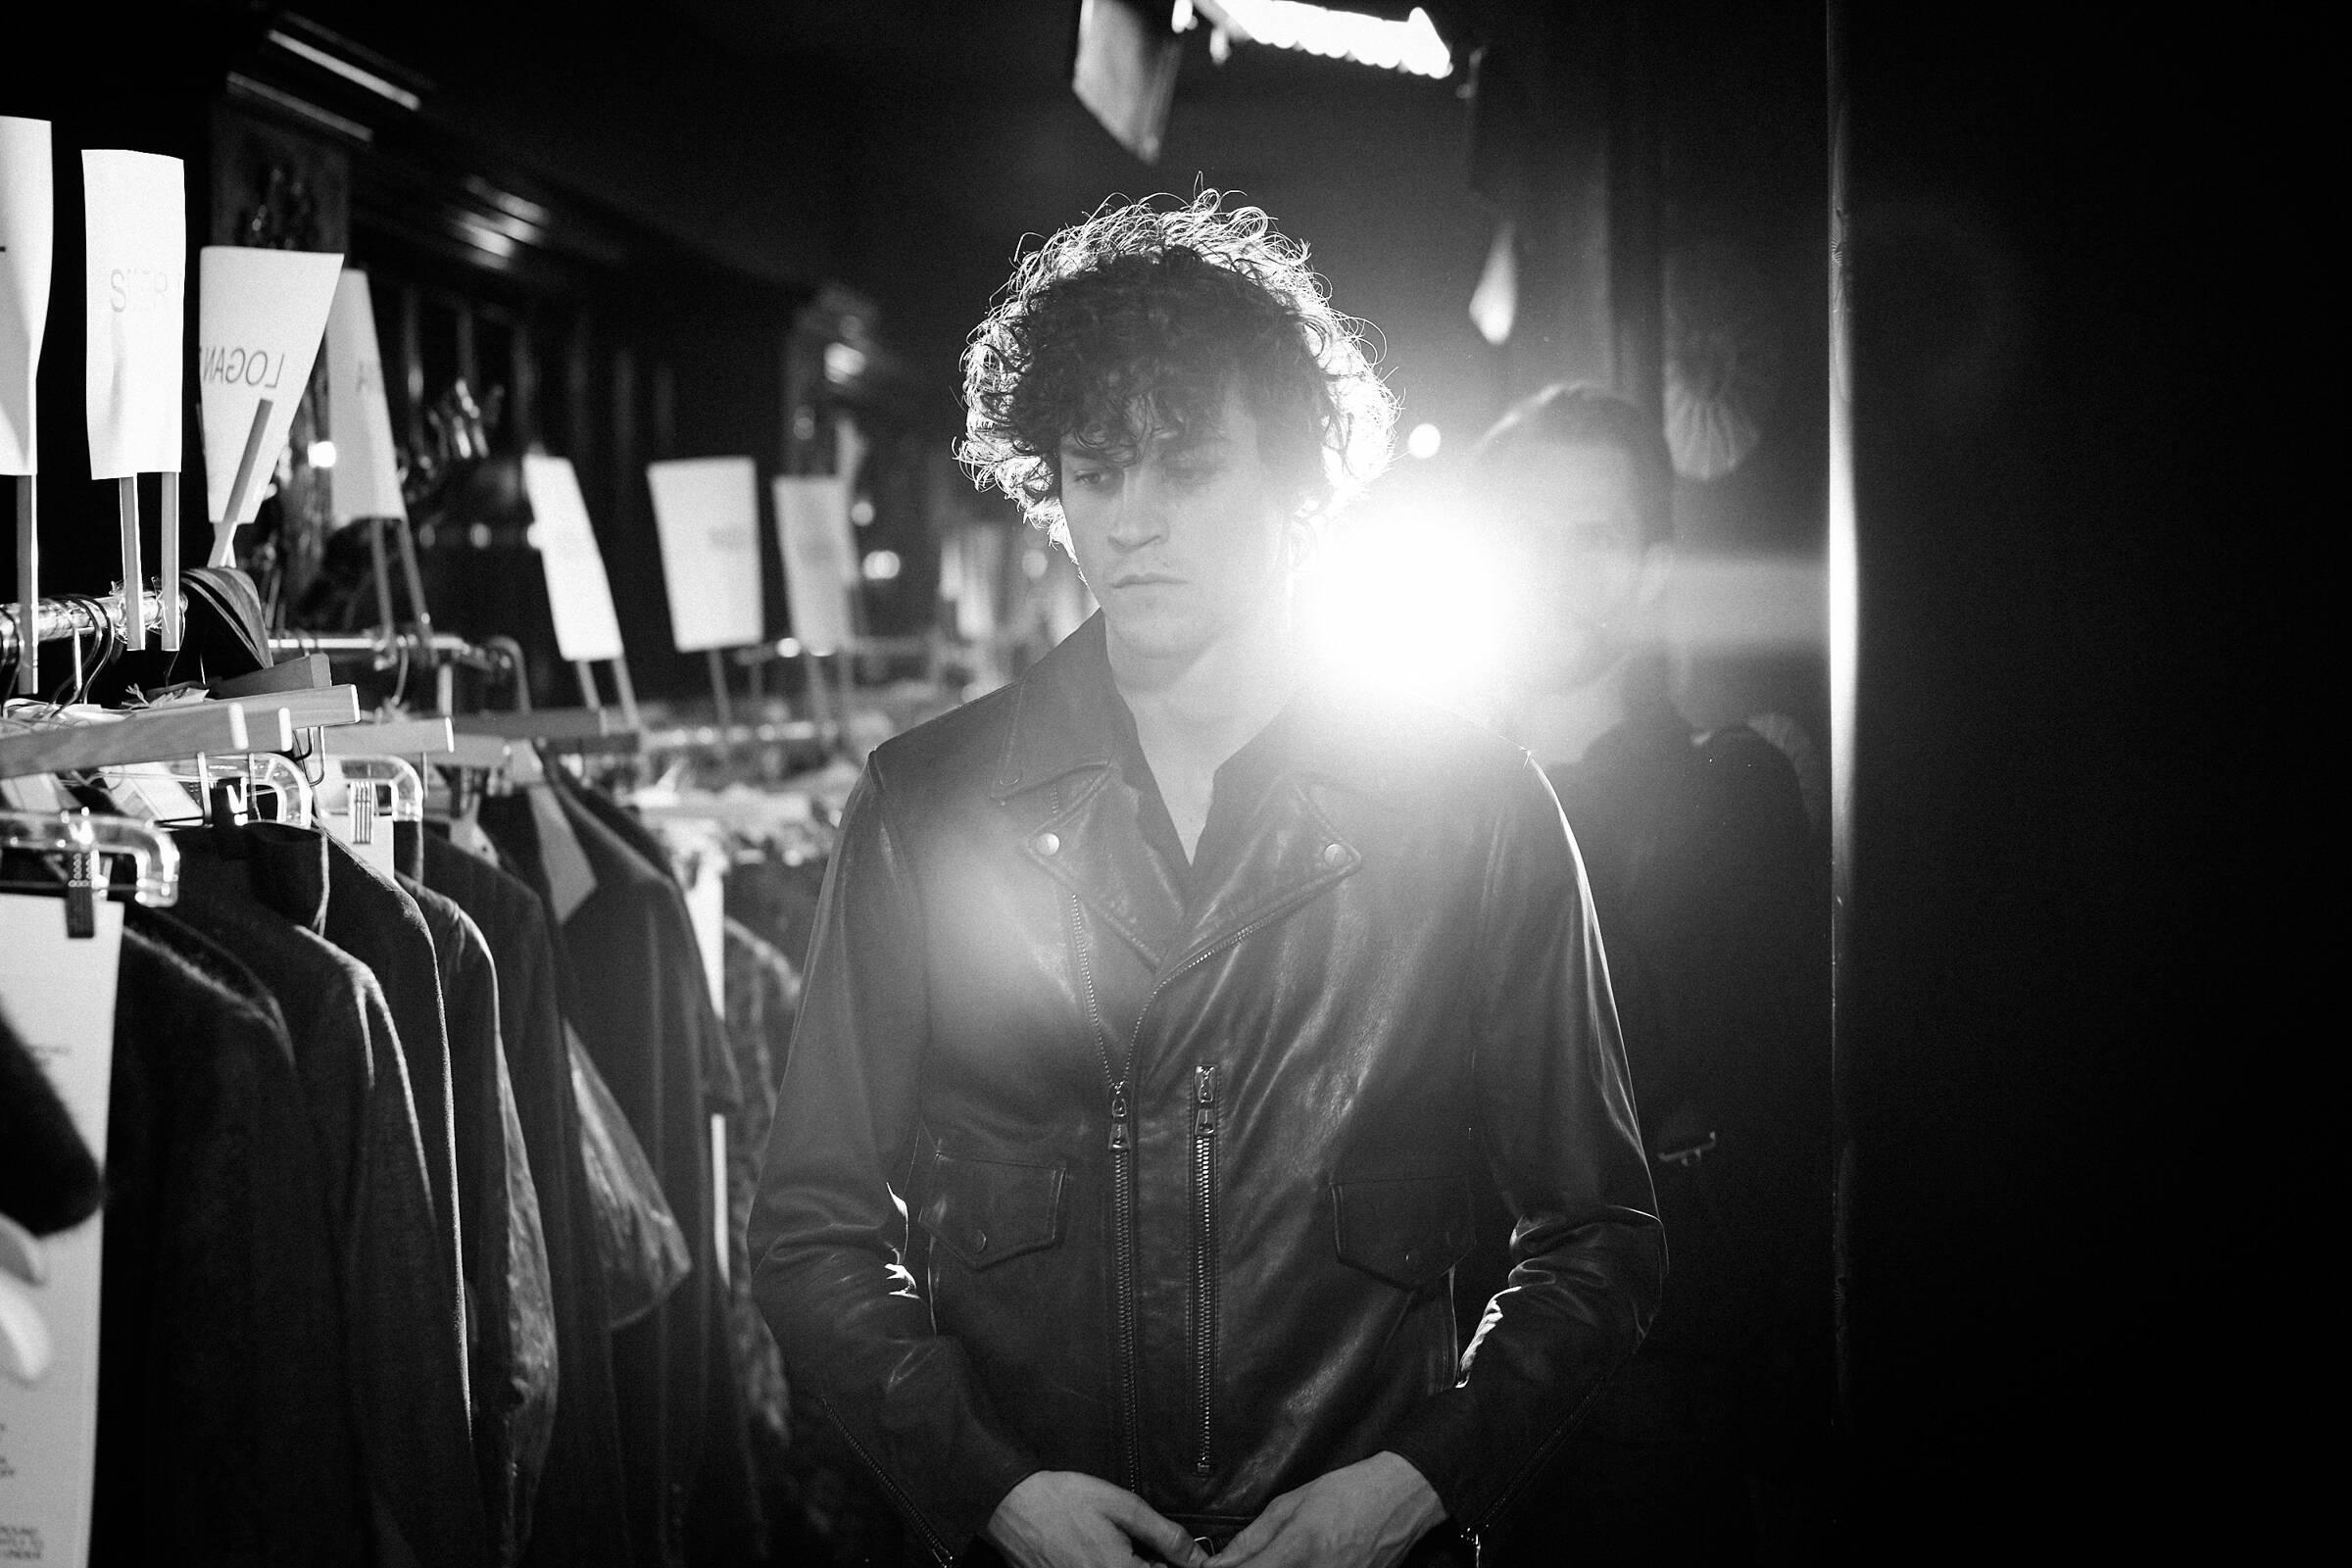 Fashion Model John Varvatos Menswear Backstage